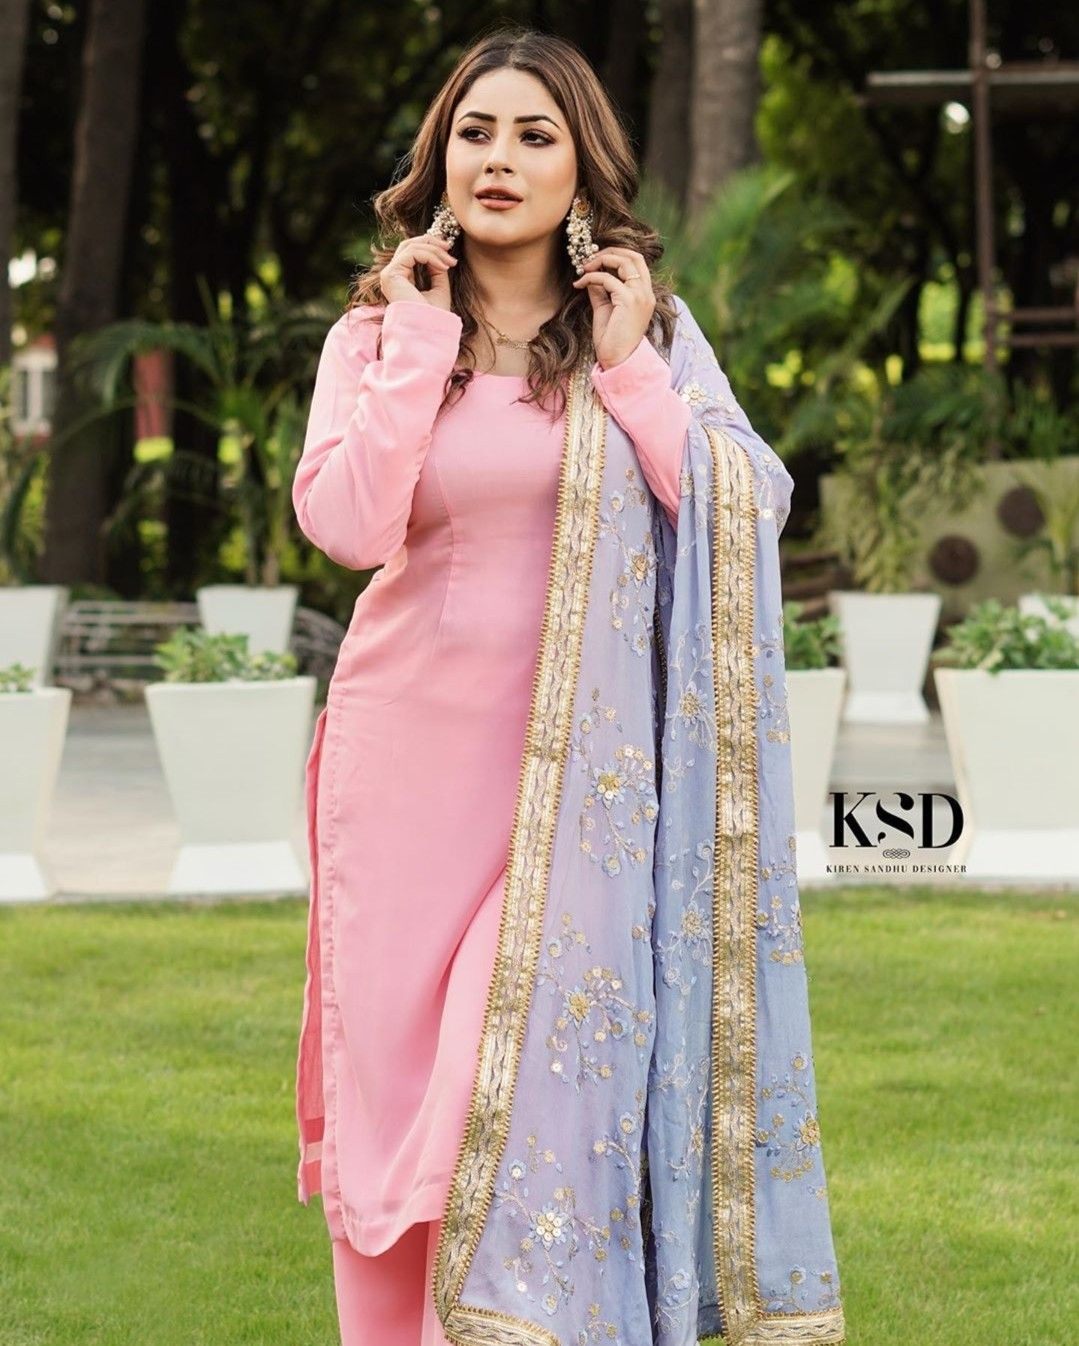 Shehnaaz Gill | Indian designer outfits, Cotton clothes women, Designer dresses indian